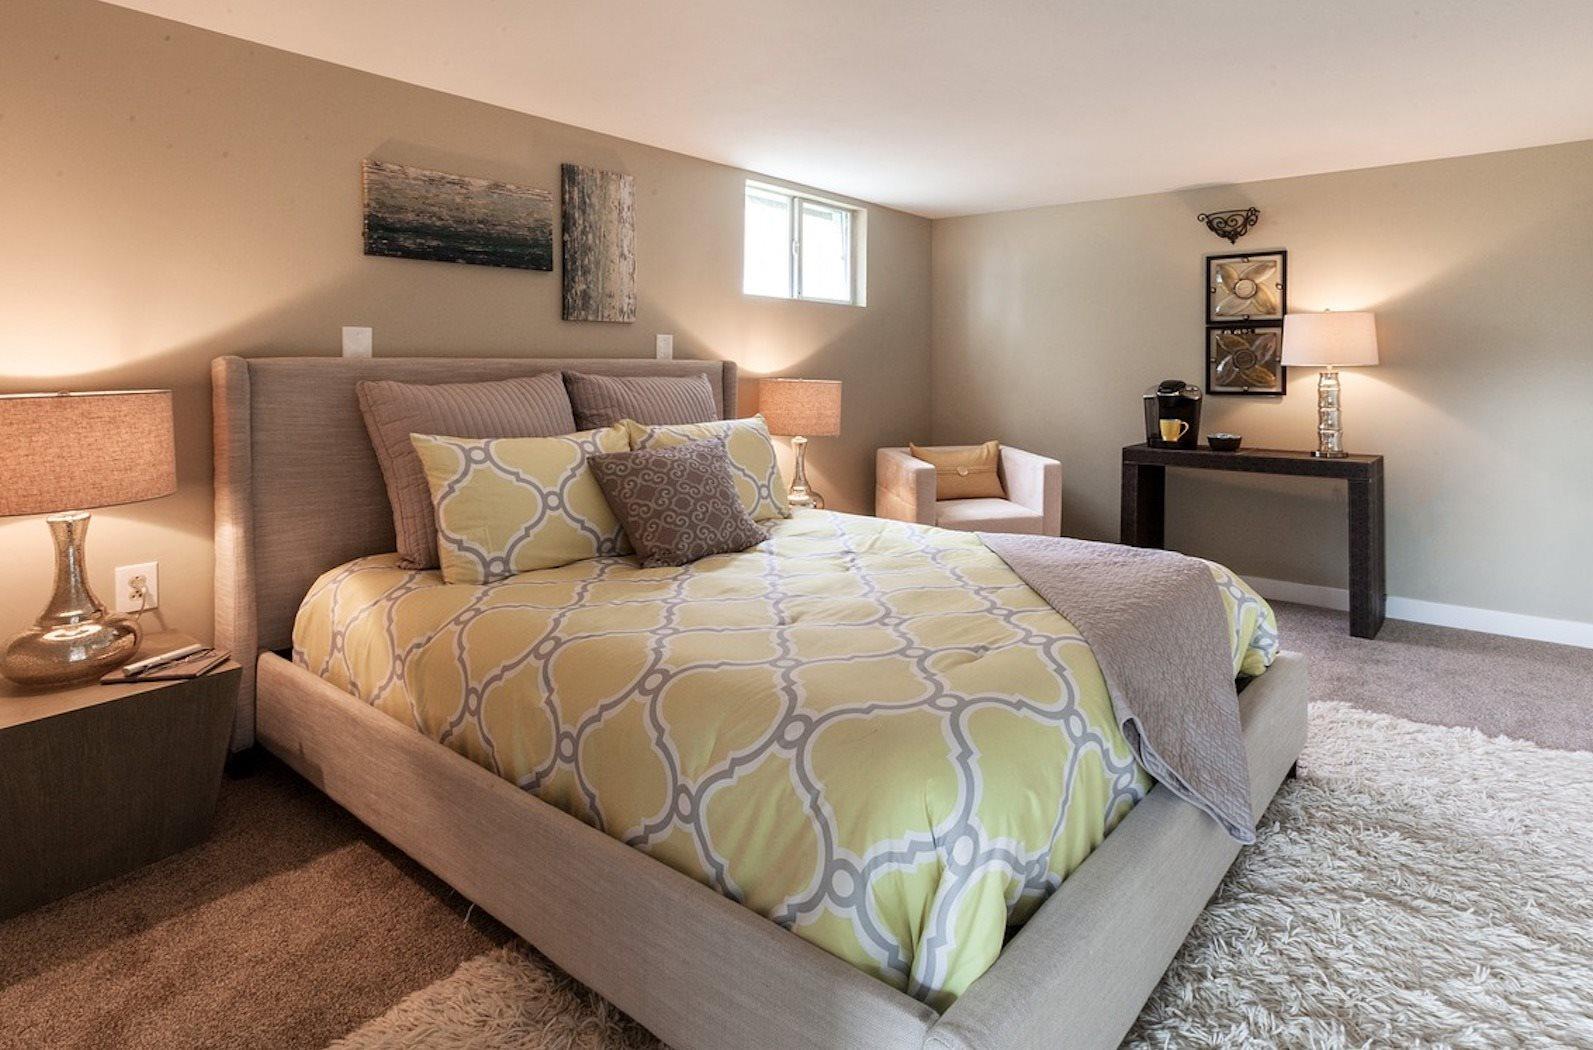 Ridge Manor Apartments in Sarasota, FL example bedroom